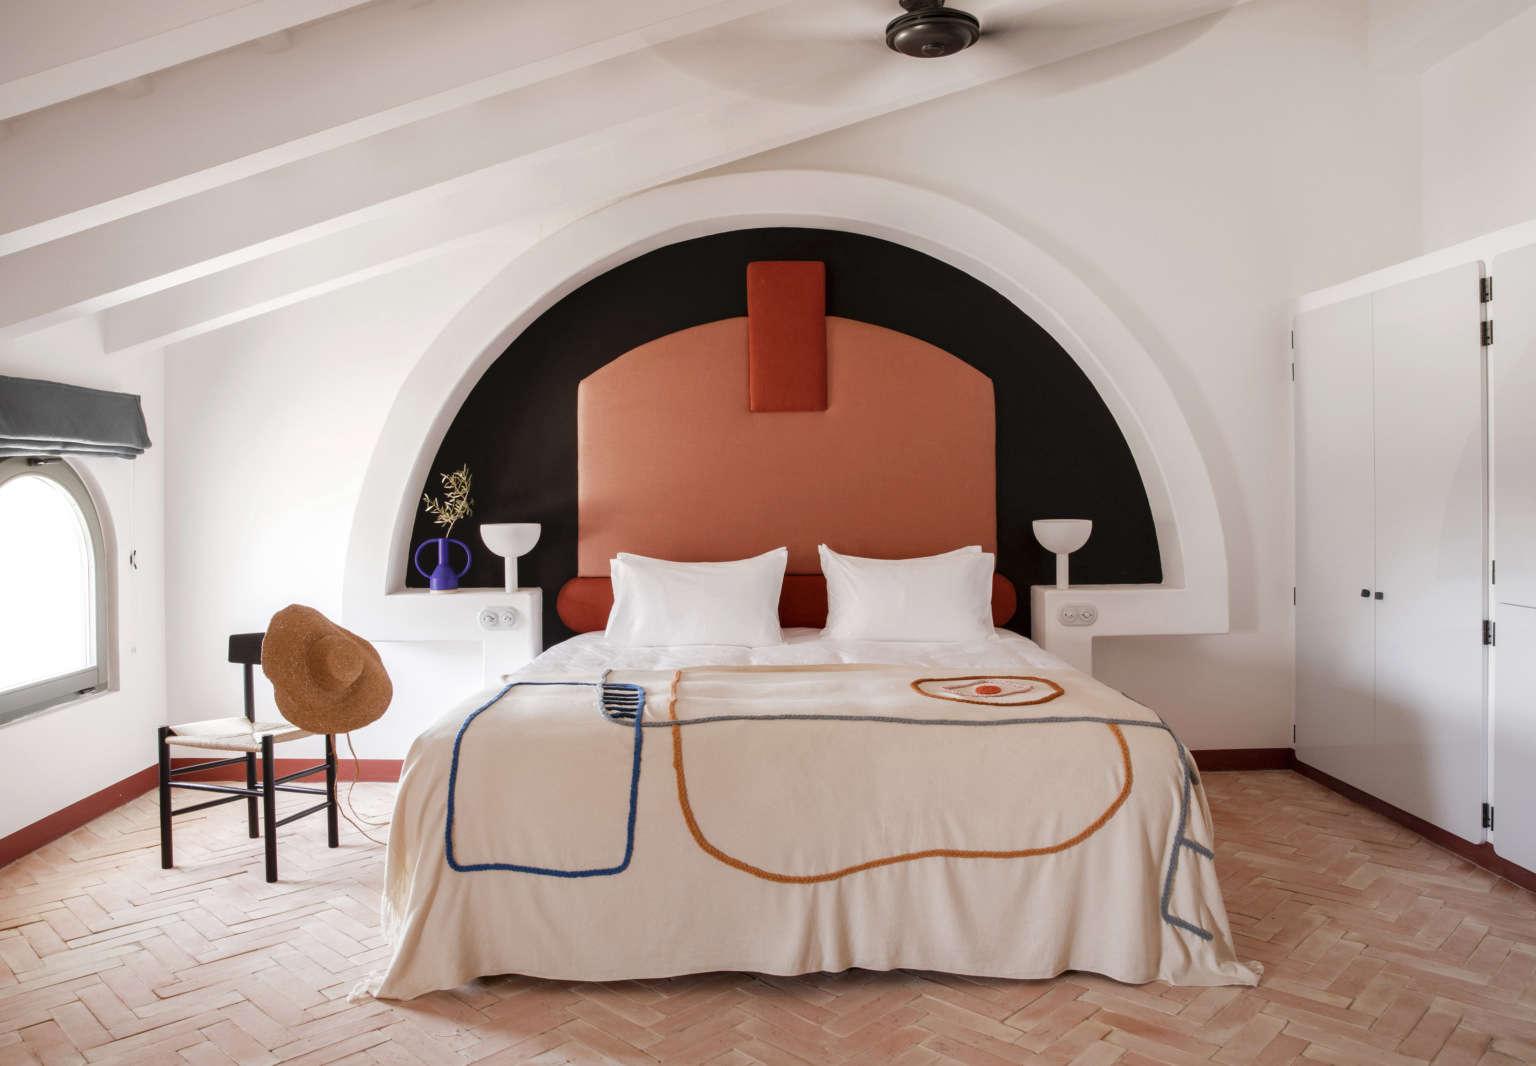 menorca experimental villa room dorothee meilichzon design karel balas photo 7 1536x1066